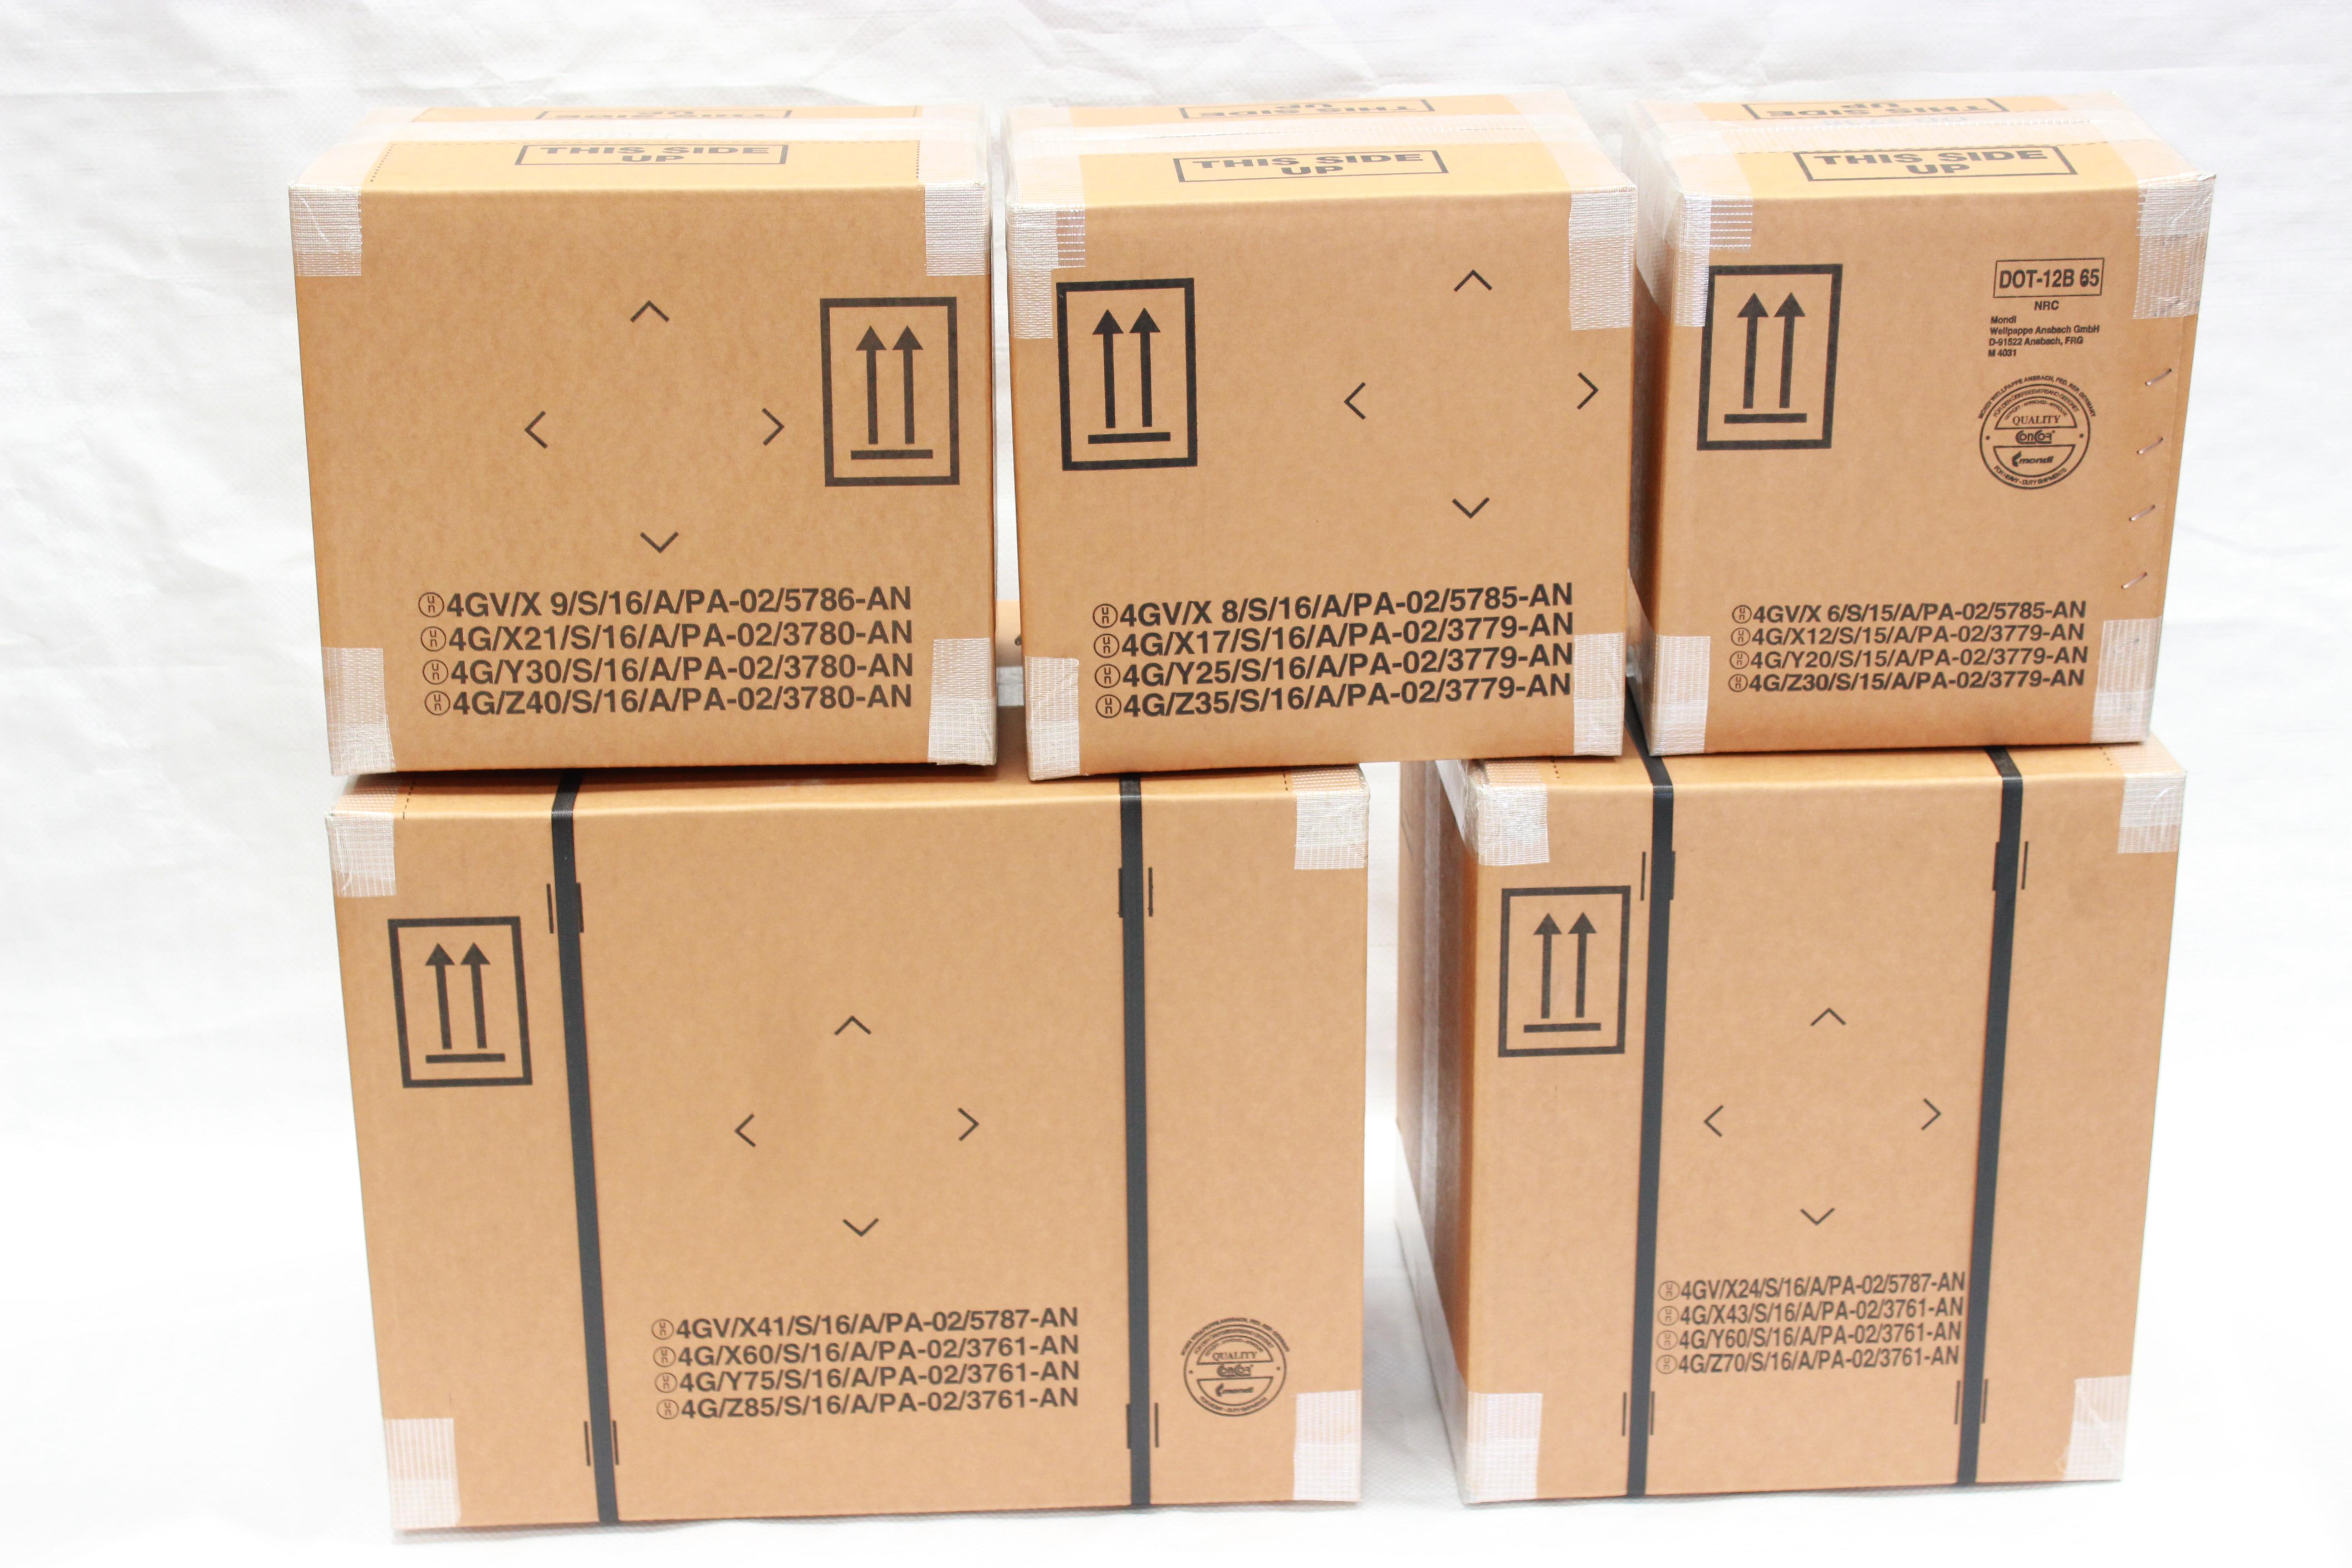 UN 4G & 4GV Fibreboard Boxes and Dangerous Goods Packaging